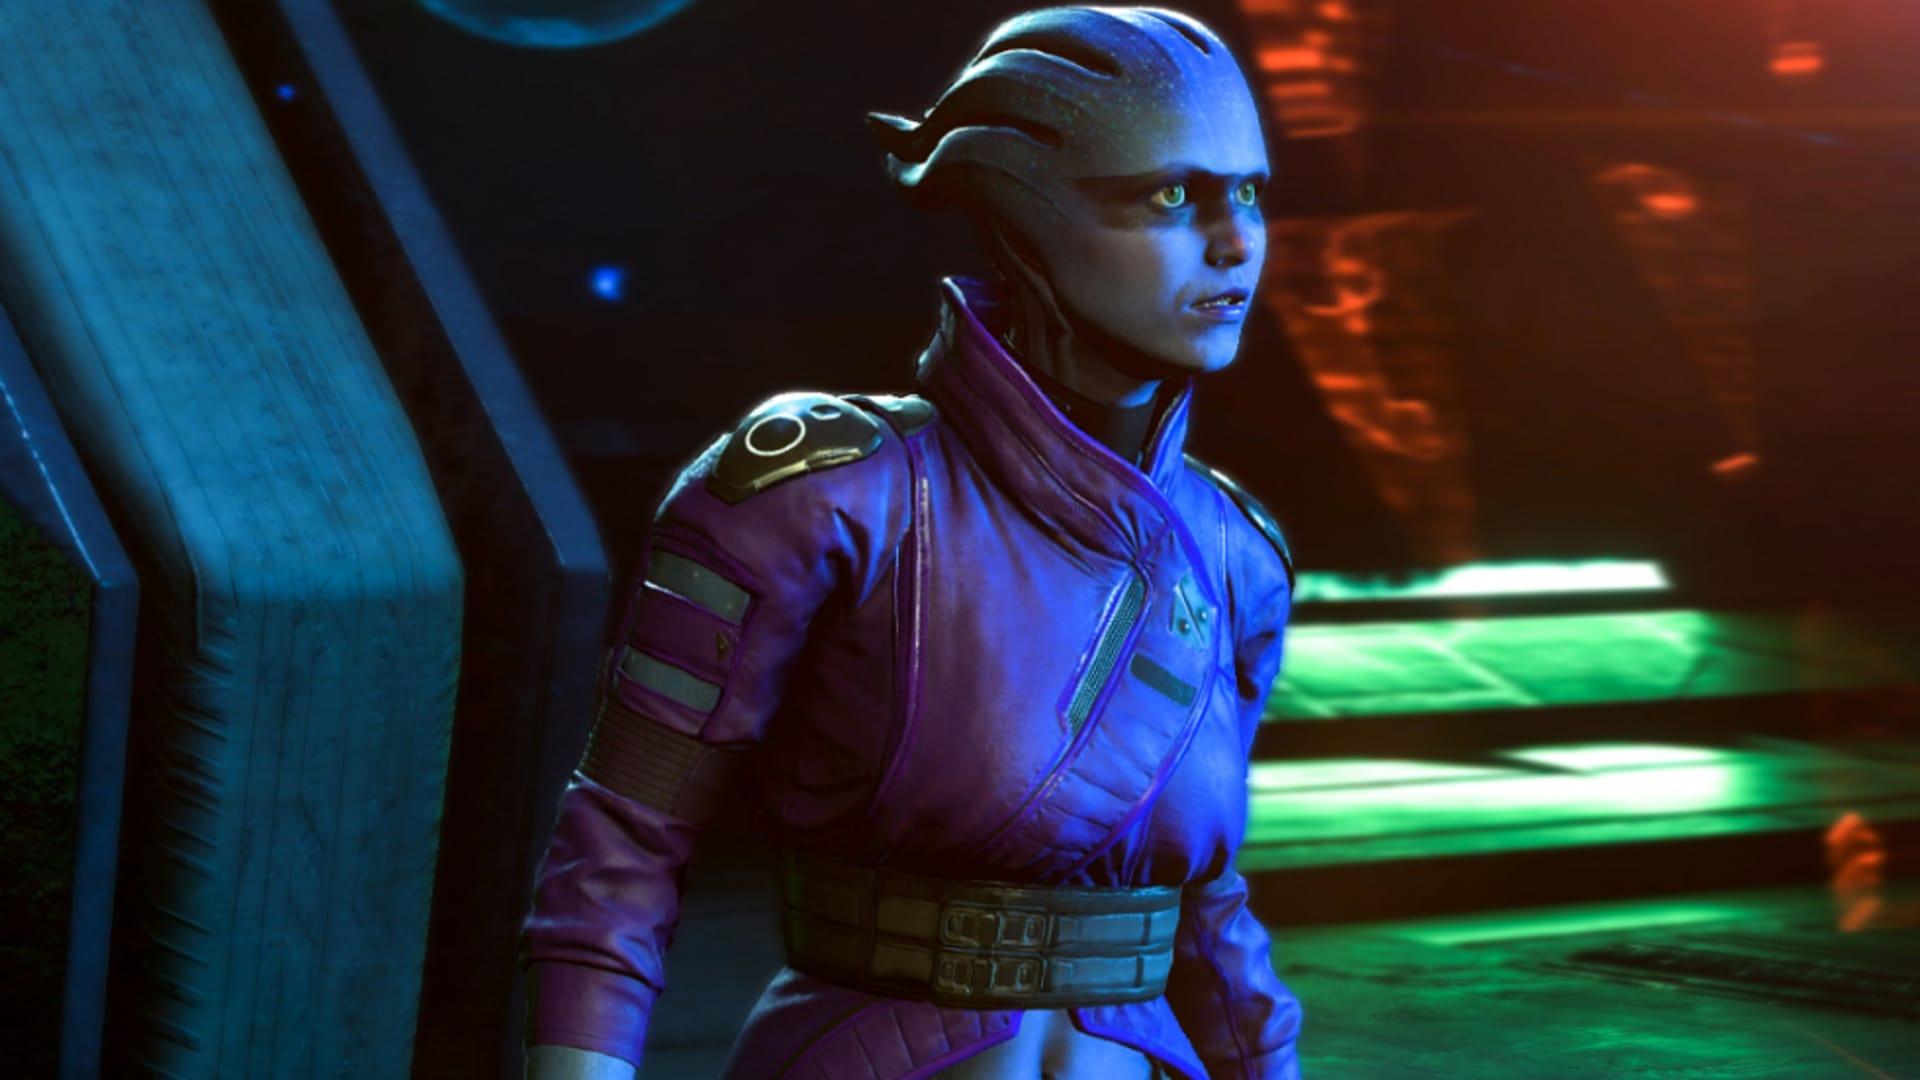 Ny gameplay-trailer från Mass Effect: Andromeda